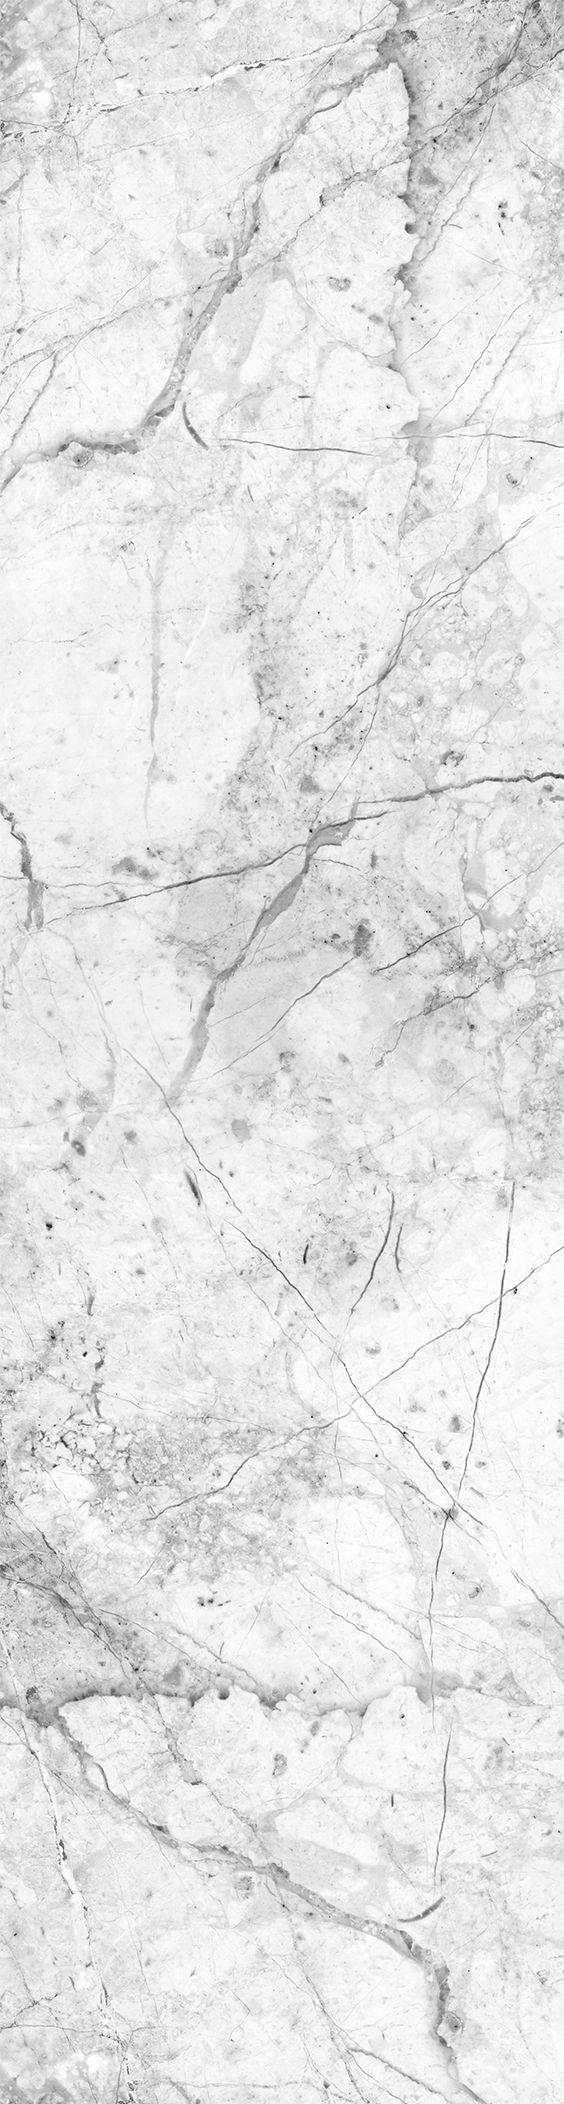 Textured White Marble MuralsWallpaper.co.uk Marbles